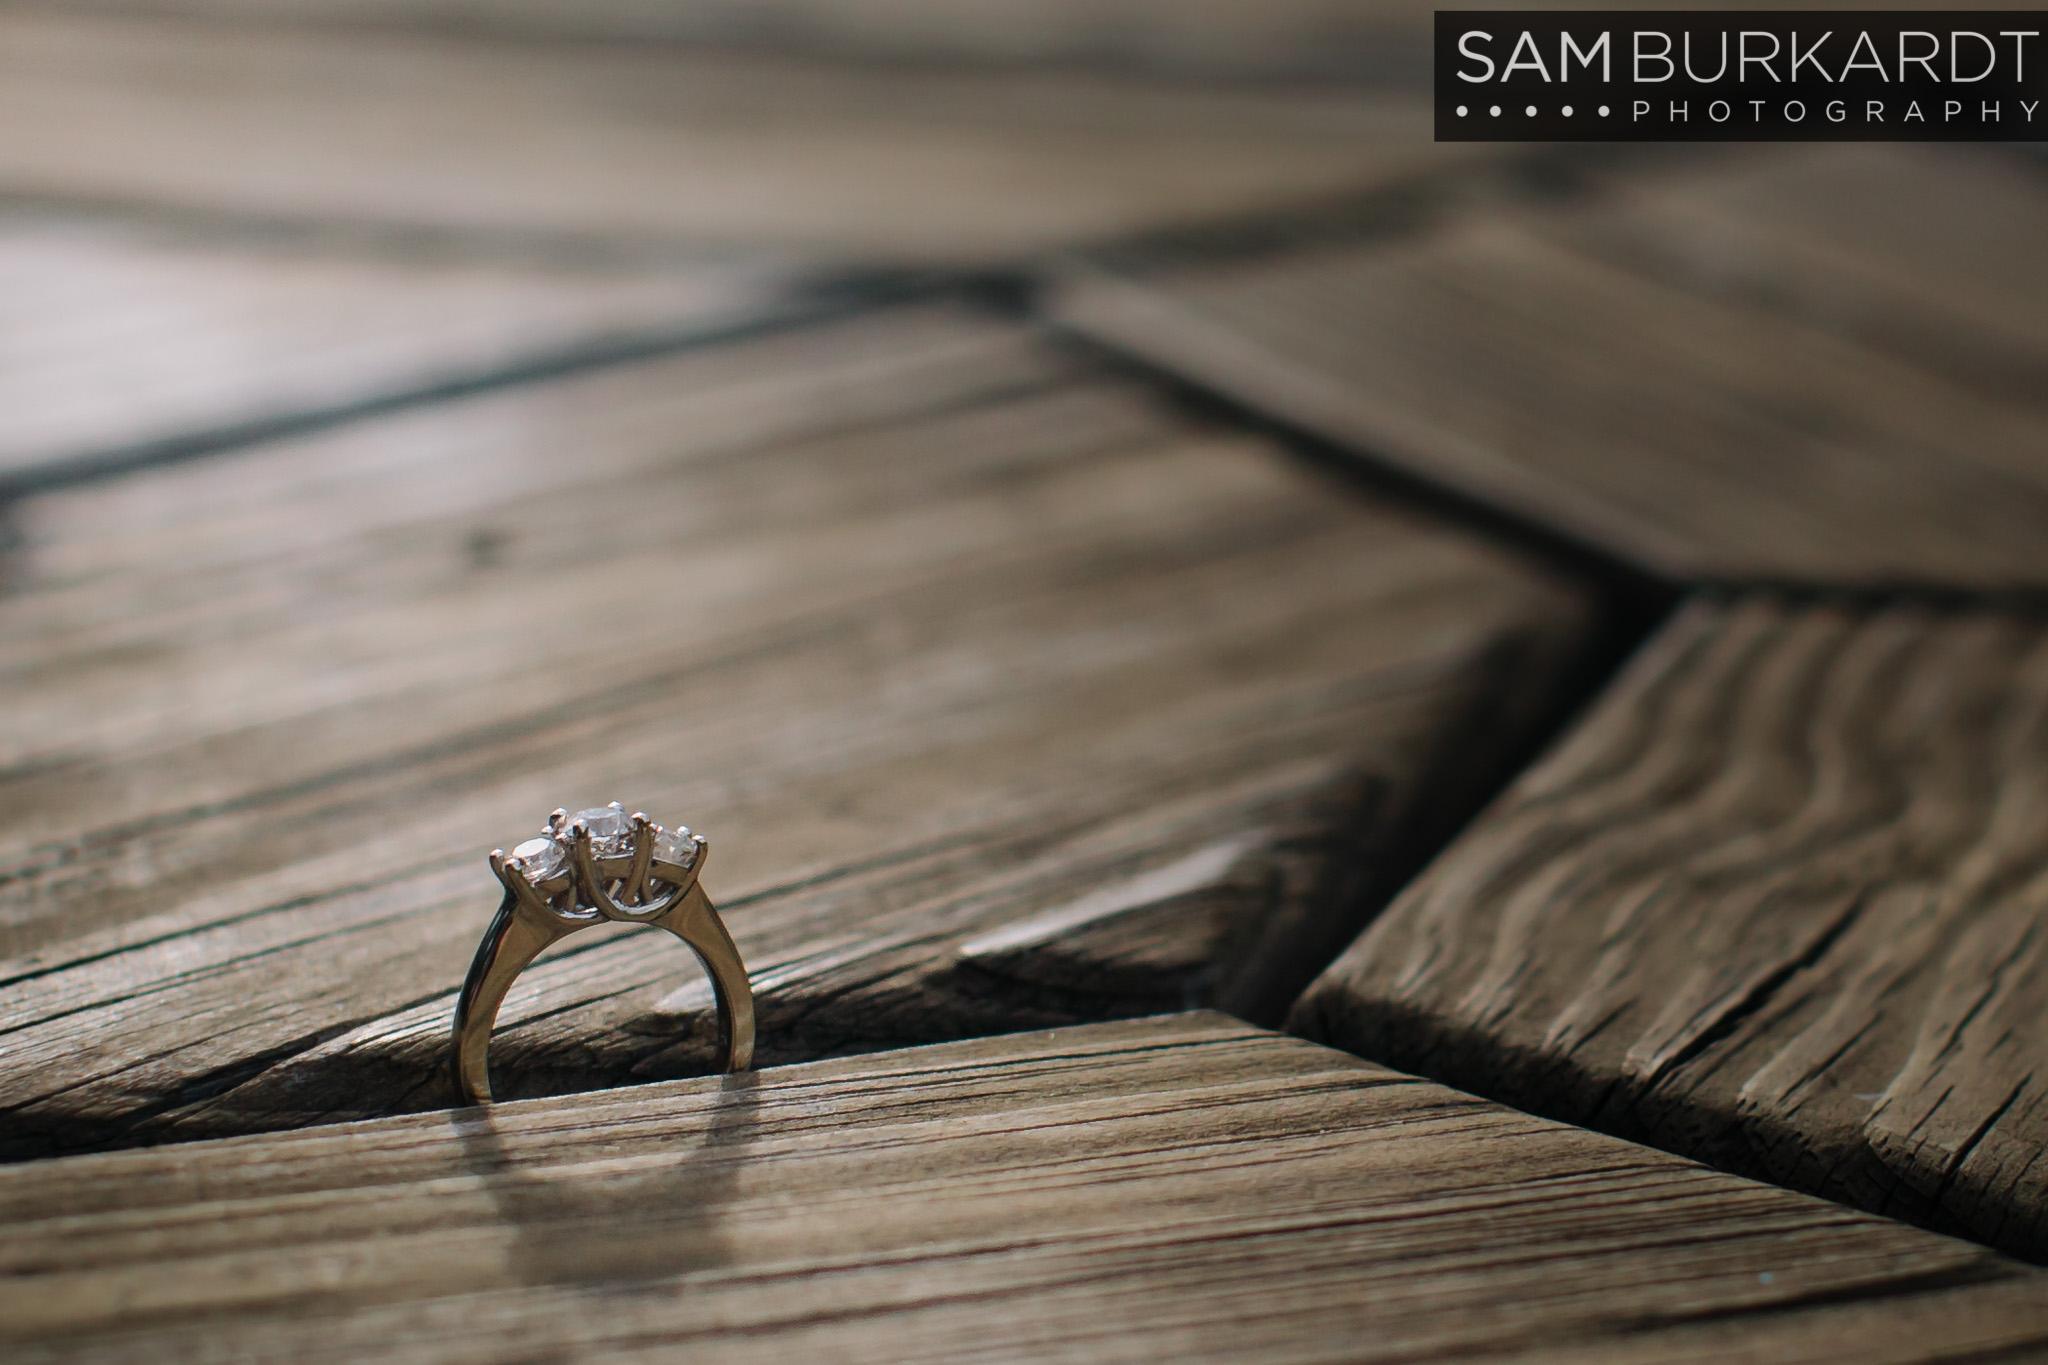 sburkardt_engagement_wedding_candlewood_lake_photography_002.jpg